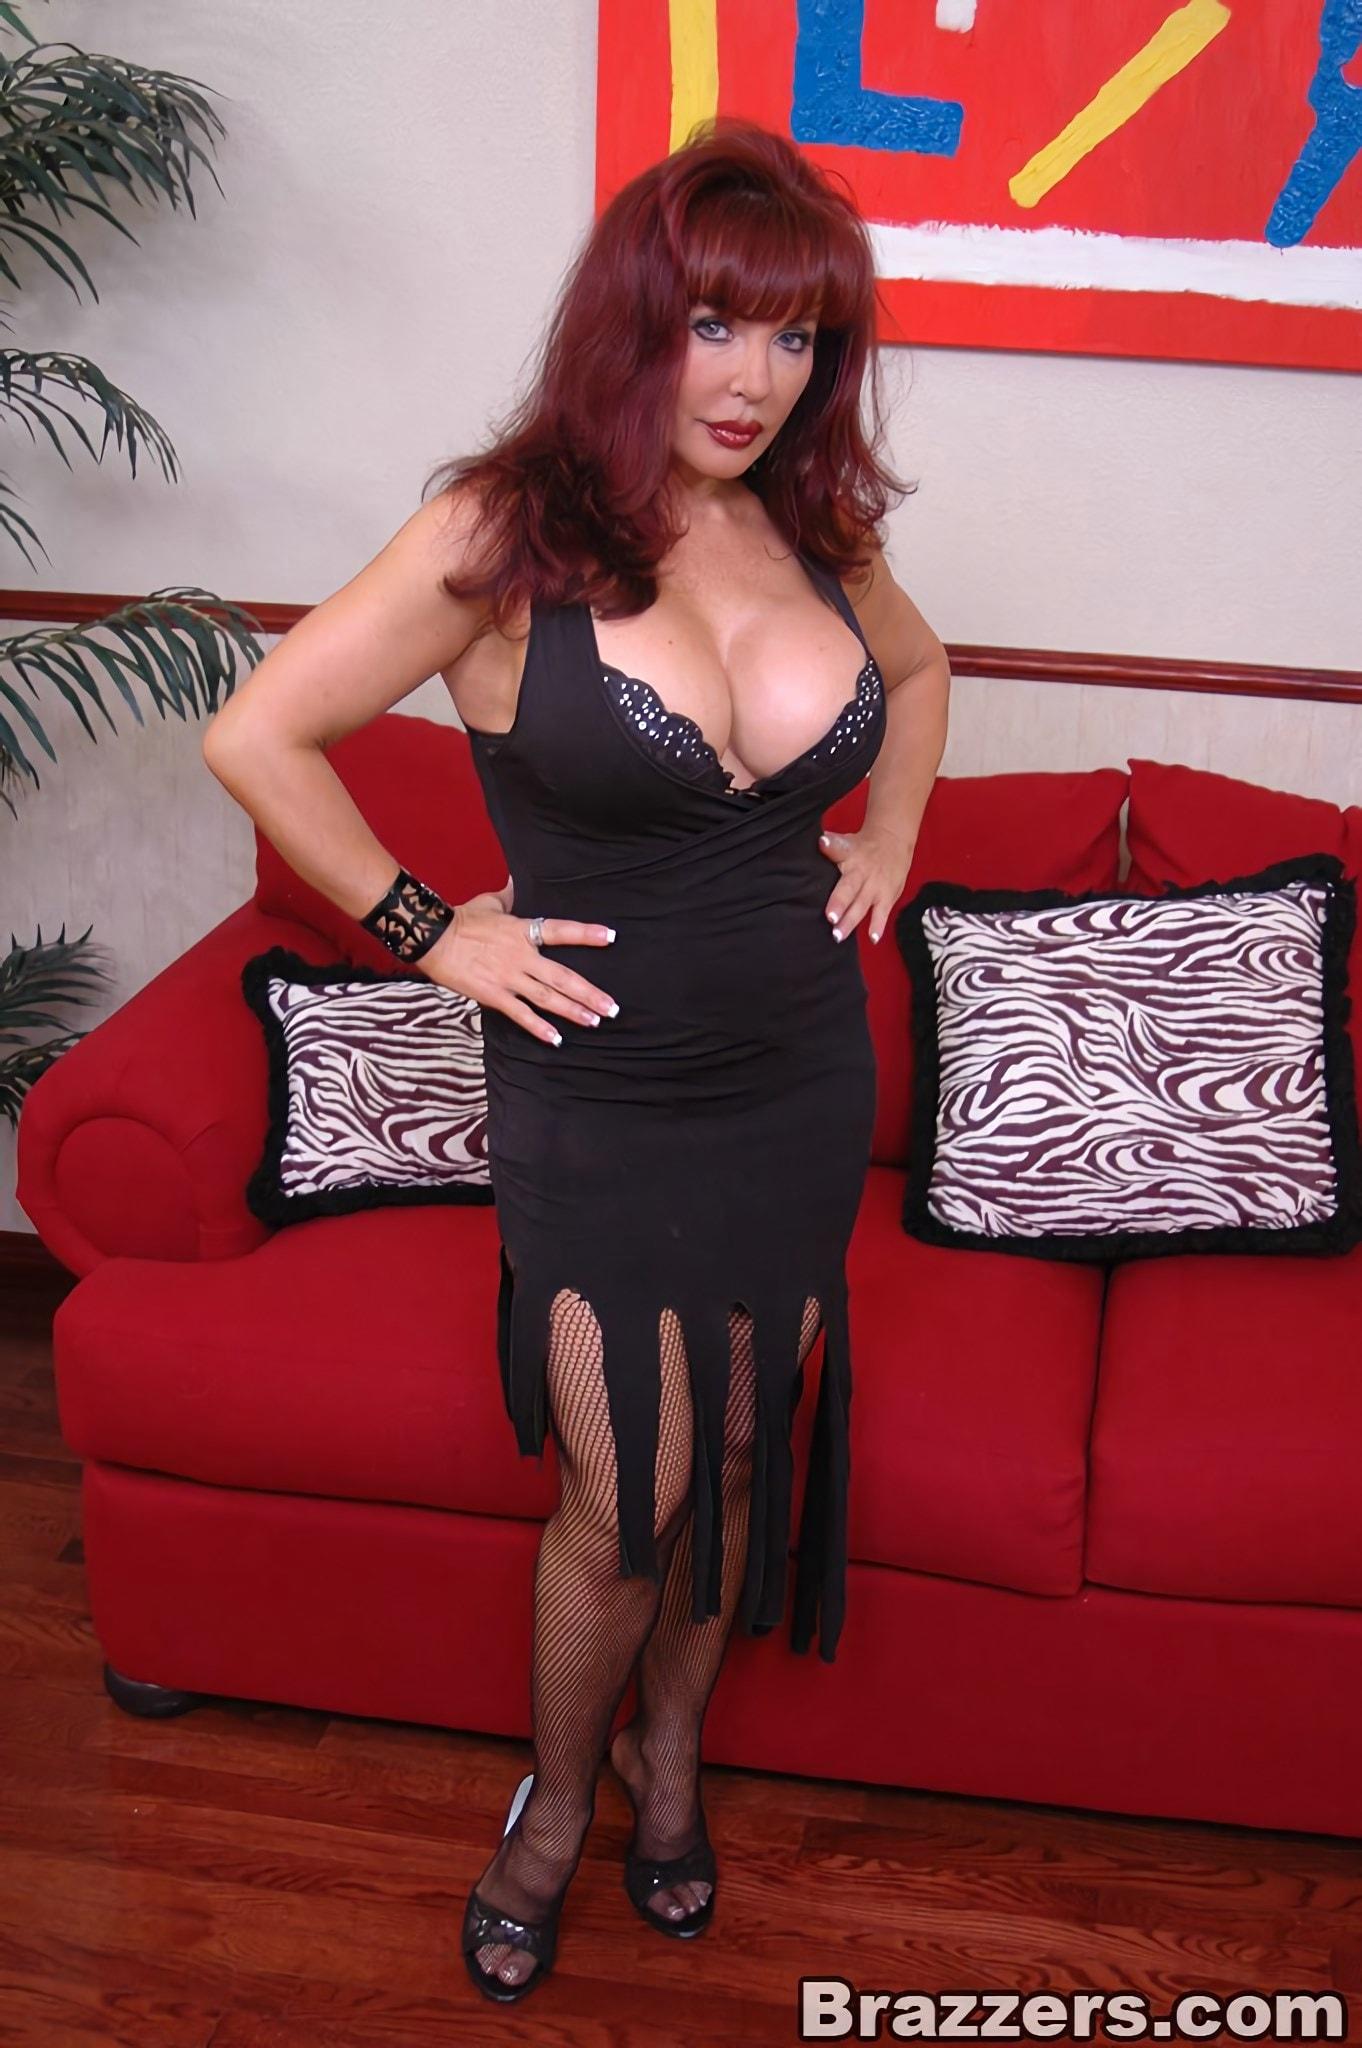 Brazzers 'Hot Busty Milf Nymph Vanessa' starring Sexy Vanessa (Photo 1)